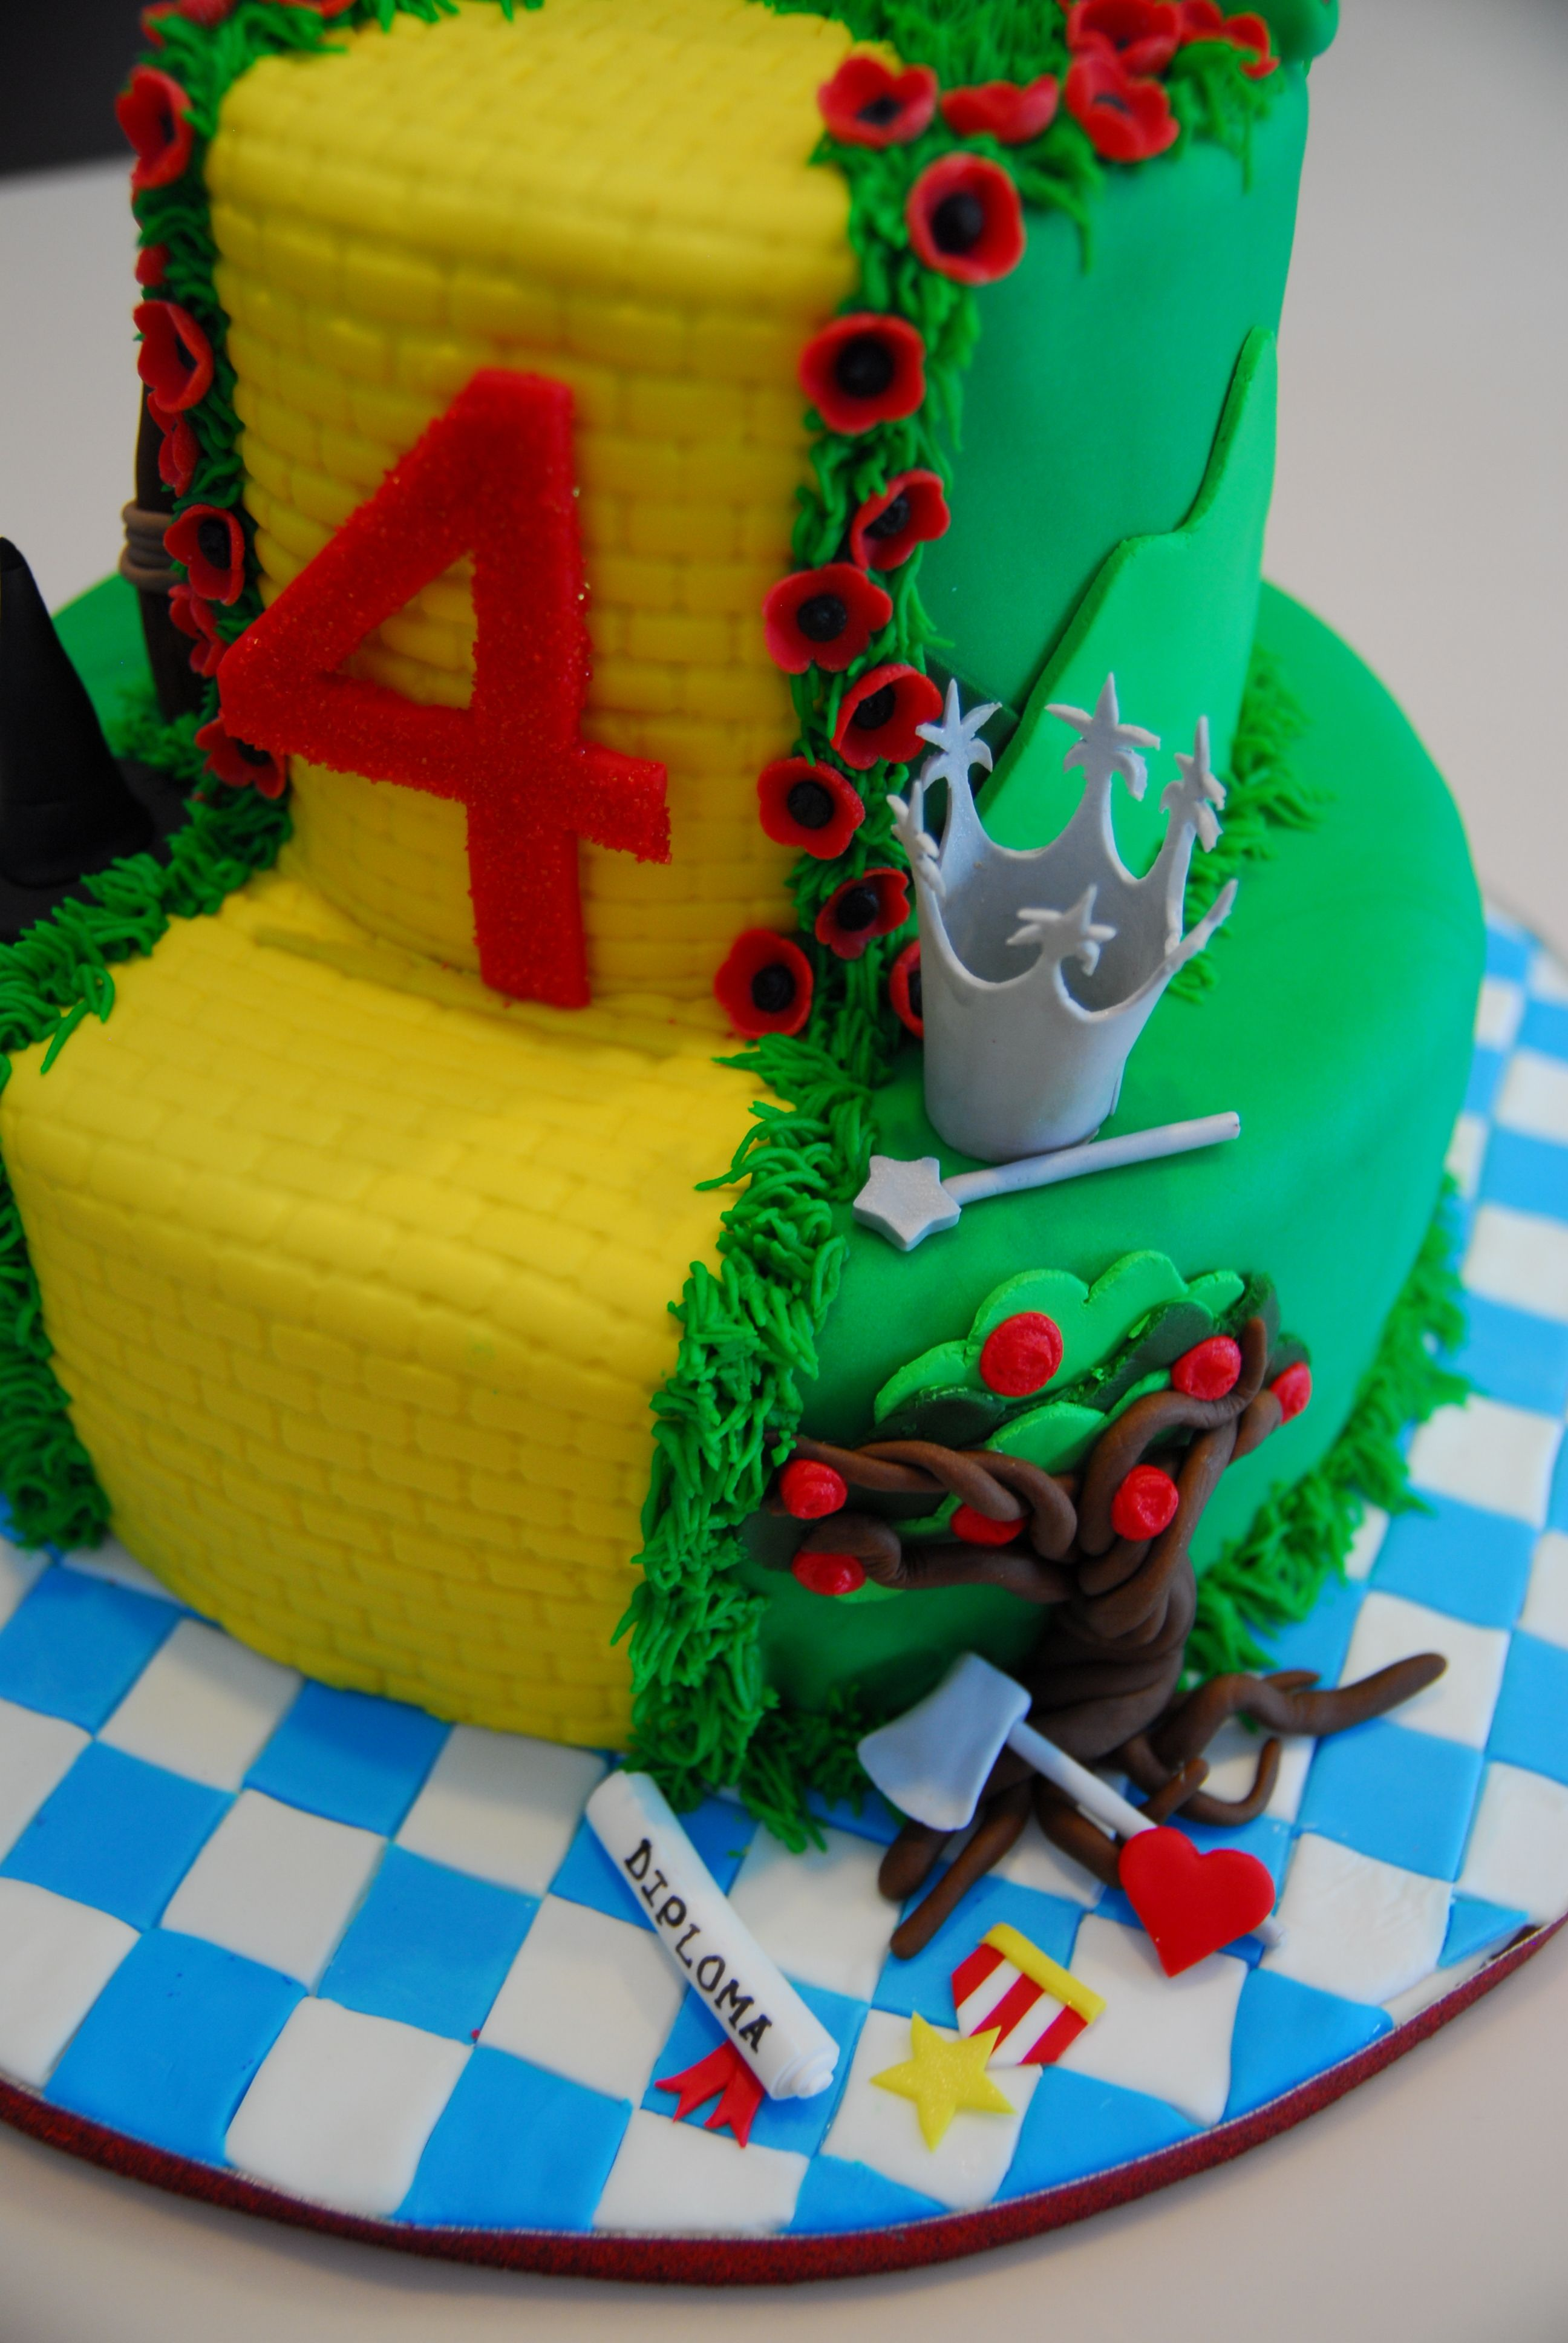 Fine Pin By Geri Hernandez On Wizard Of Oz Birthday Cake Kids Cake Funny Birthday Cards Online Bapapcheapnameinfo